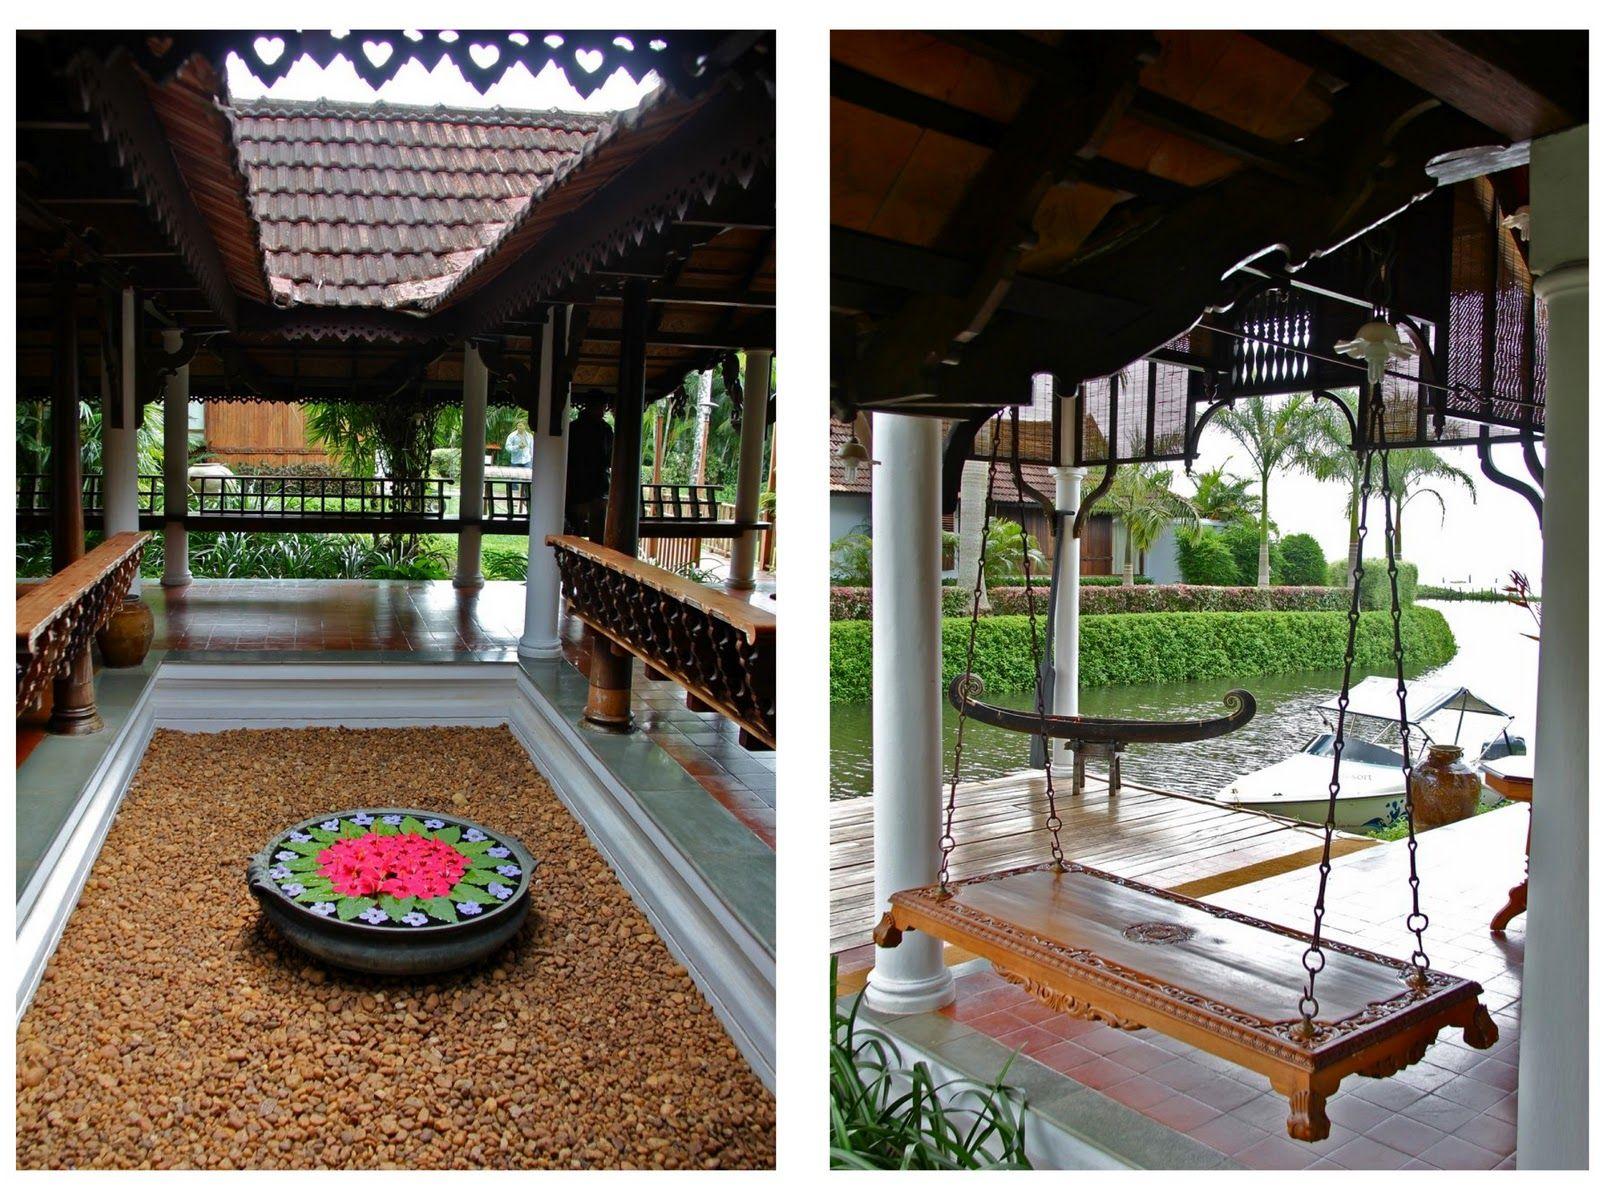 Perfect! Kerala courtyard traditional homes always kept